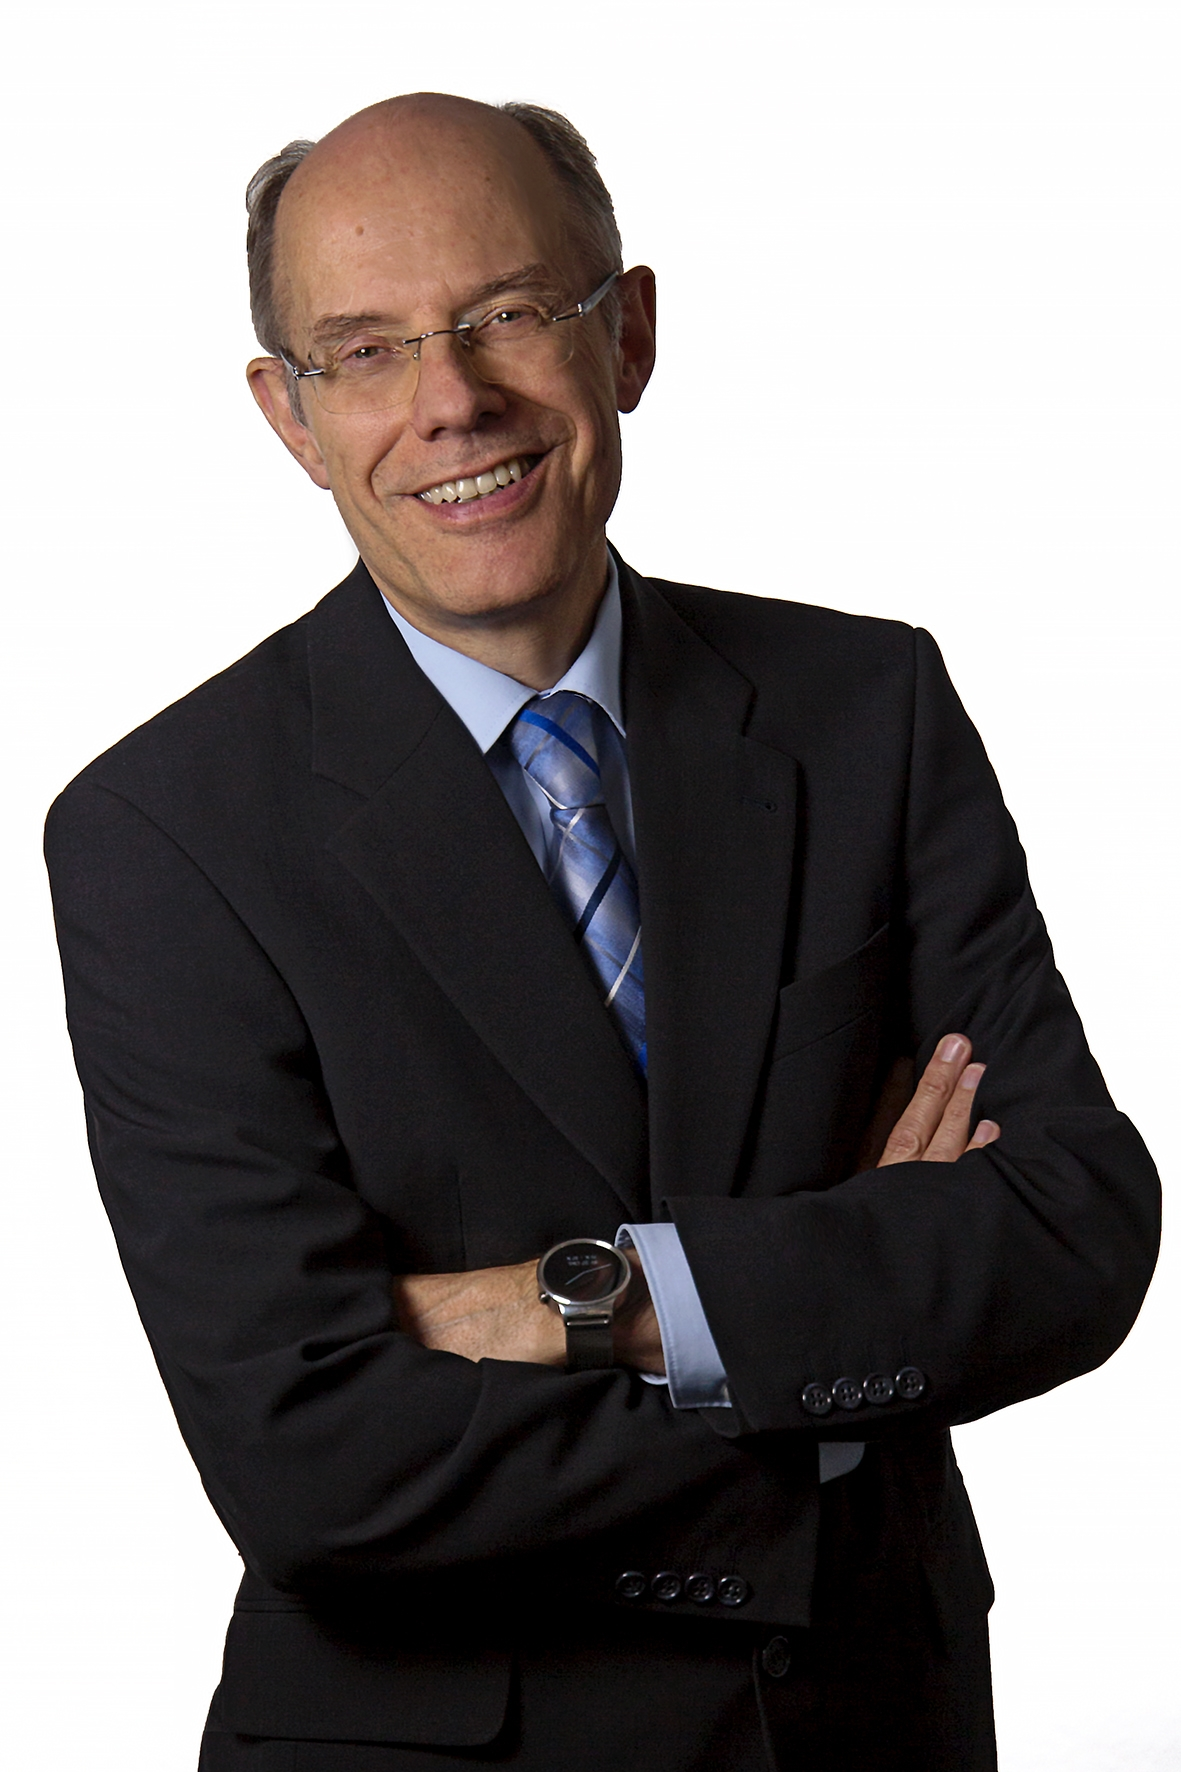 Dr. Wolfgang Kömpf